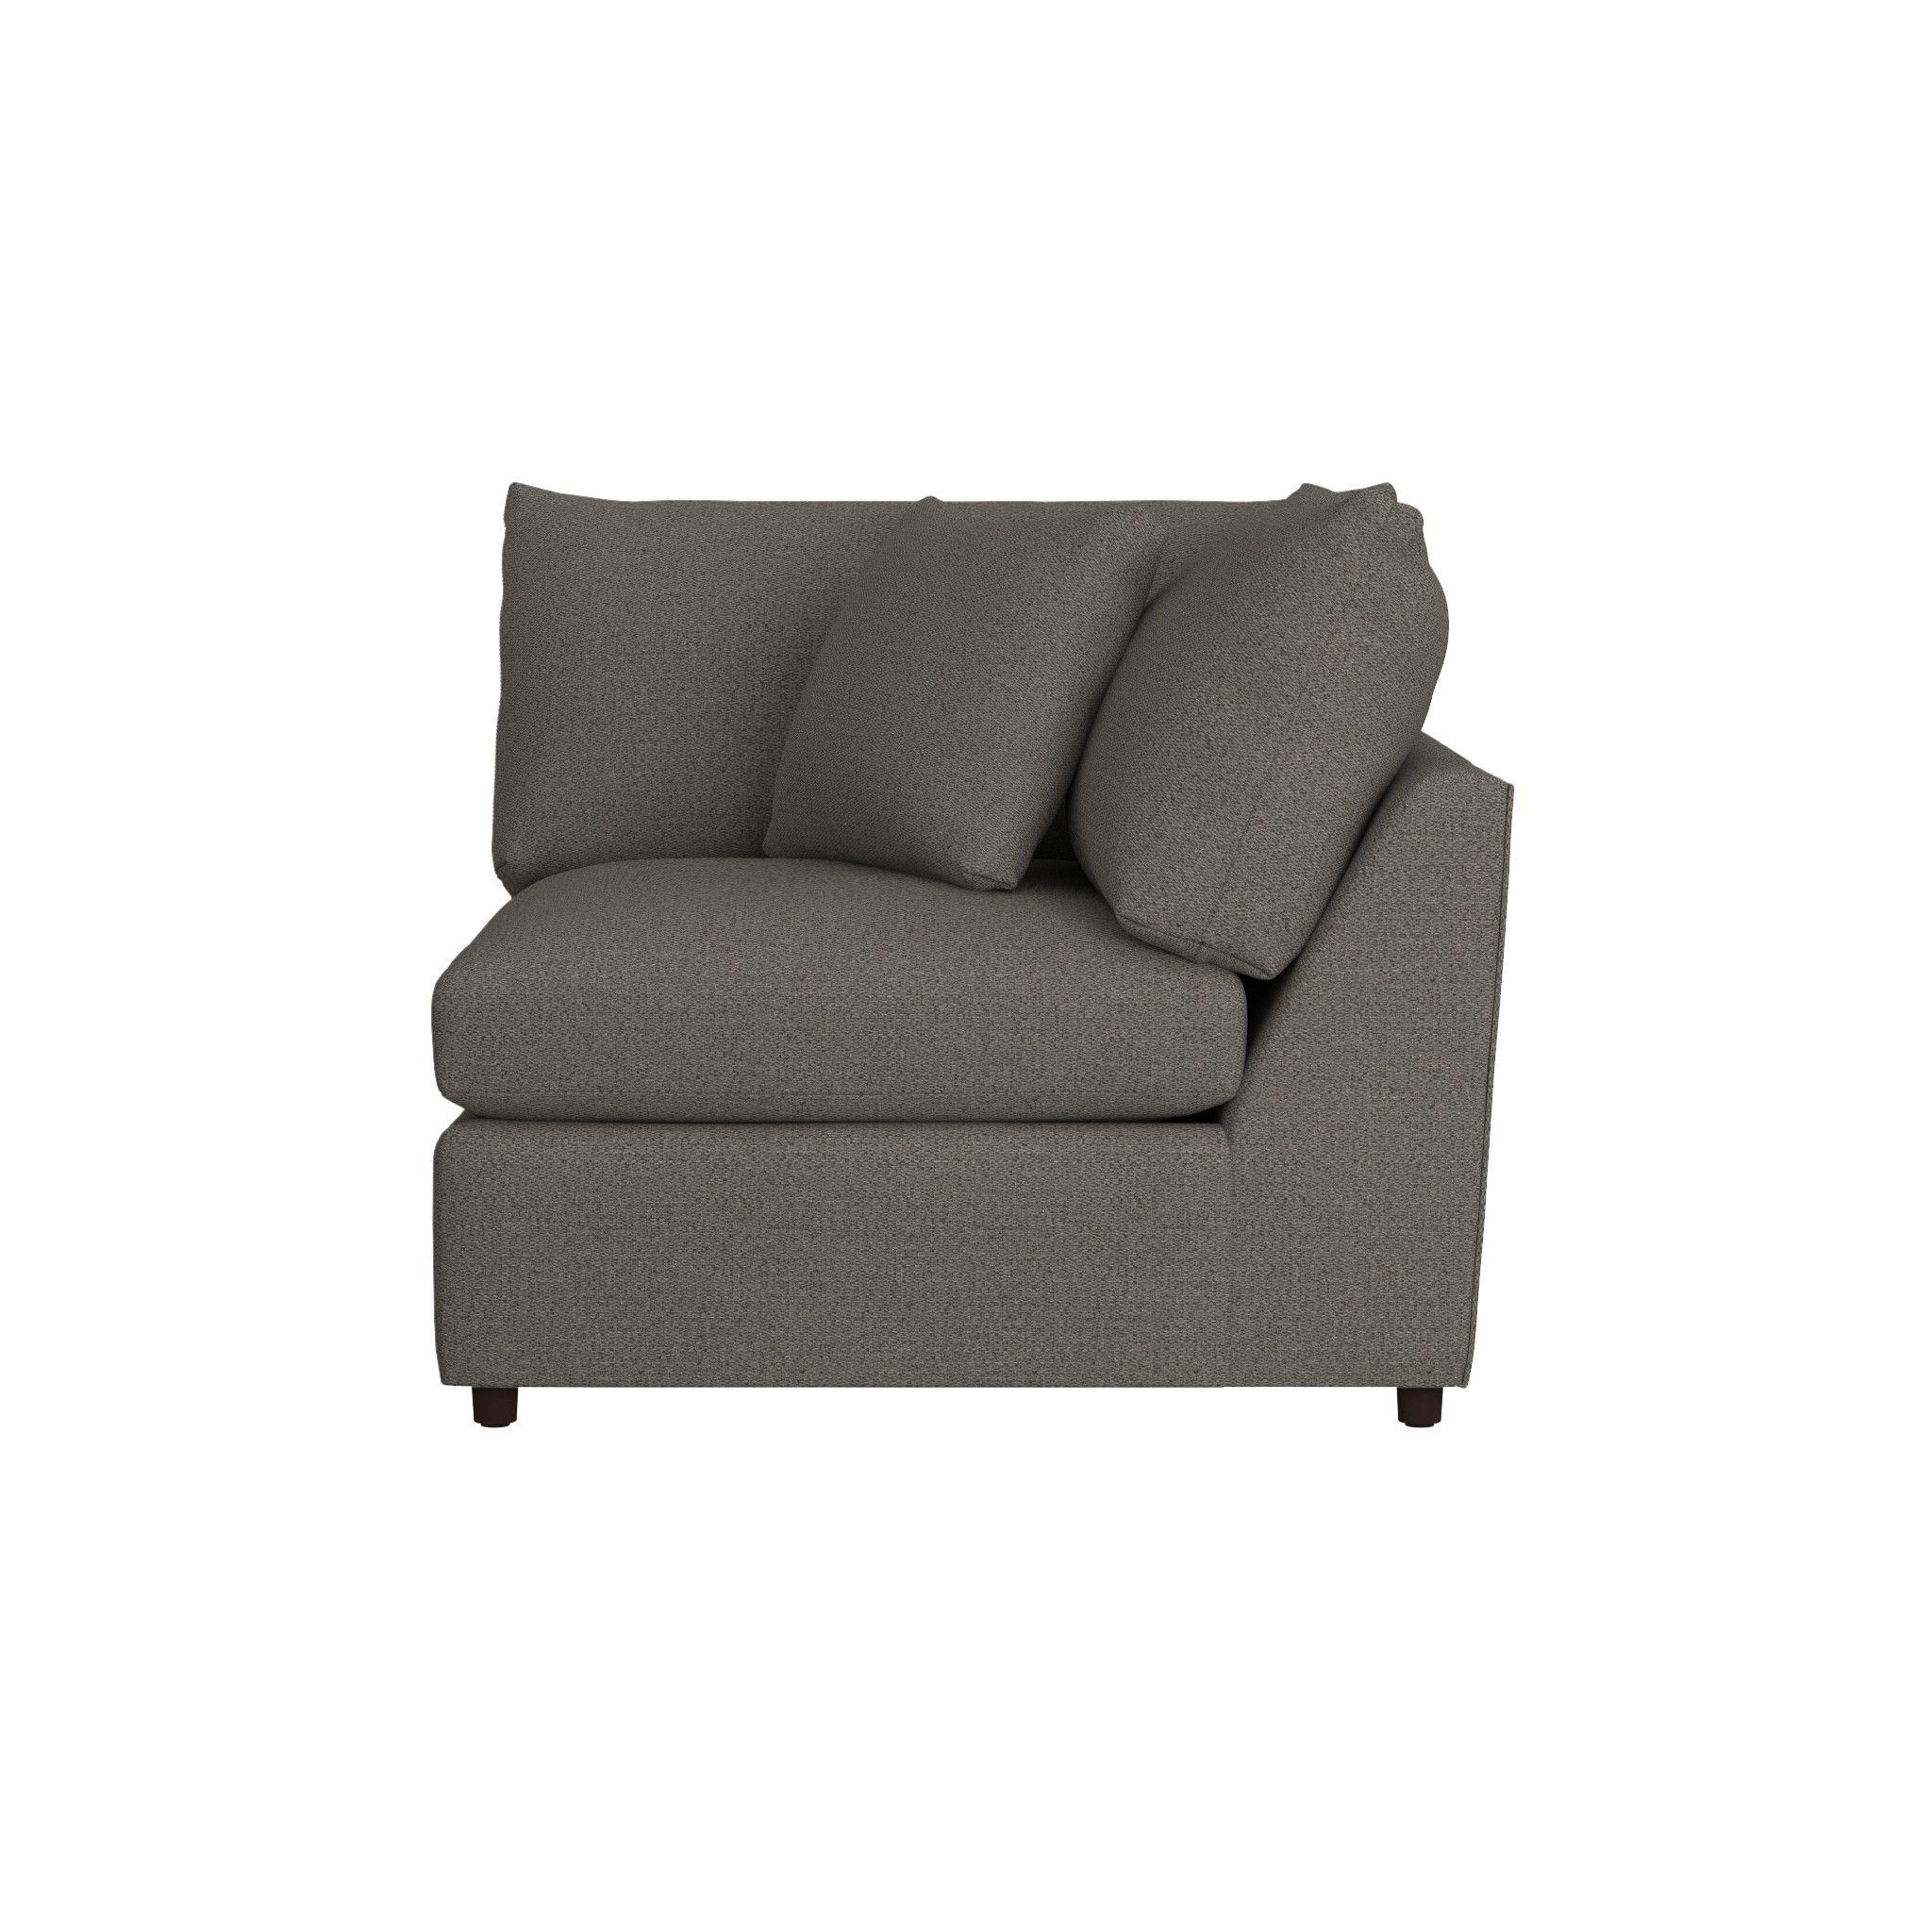 Lounge II Petite Corner Chair Corner chair, Sectional